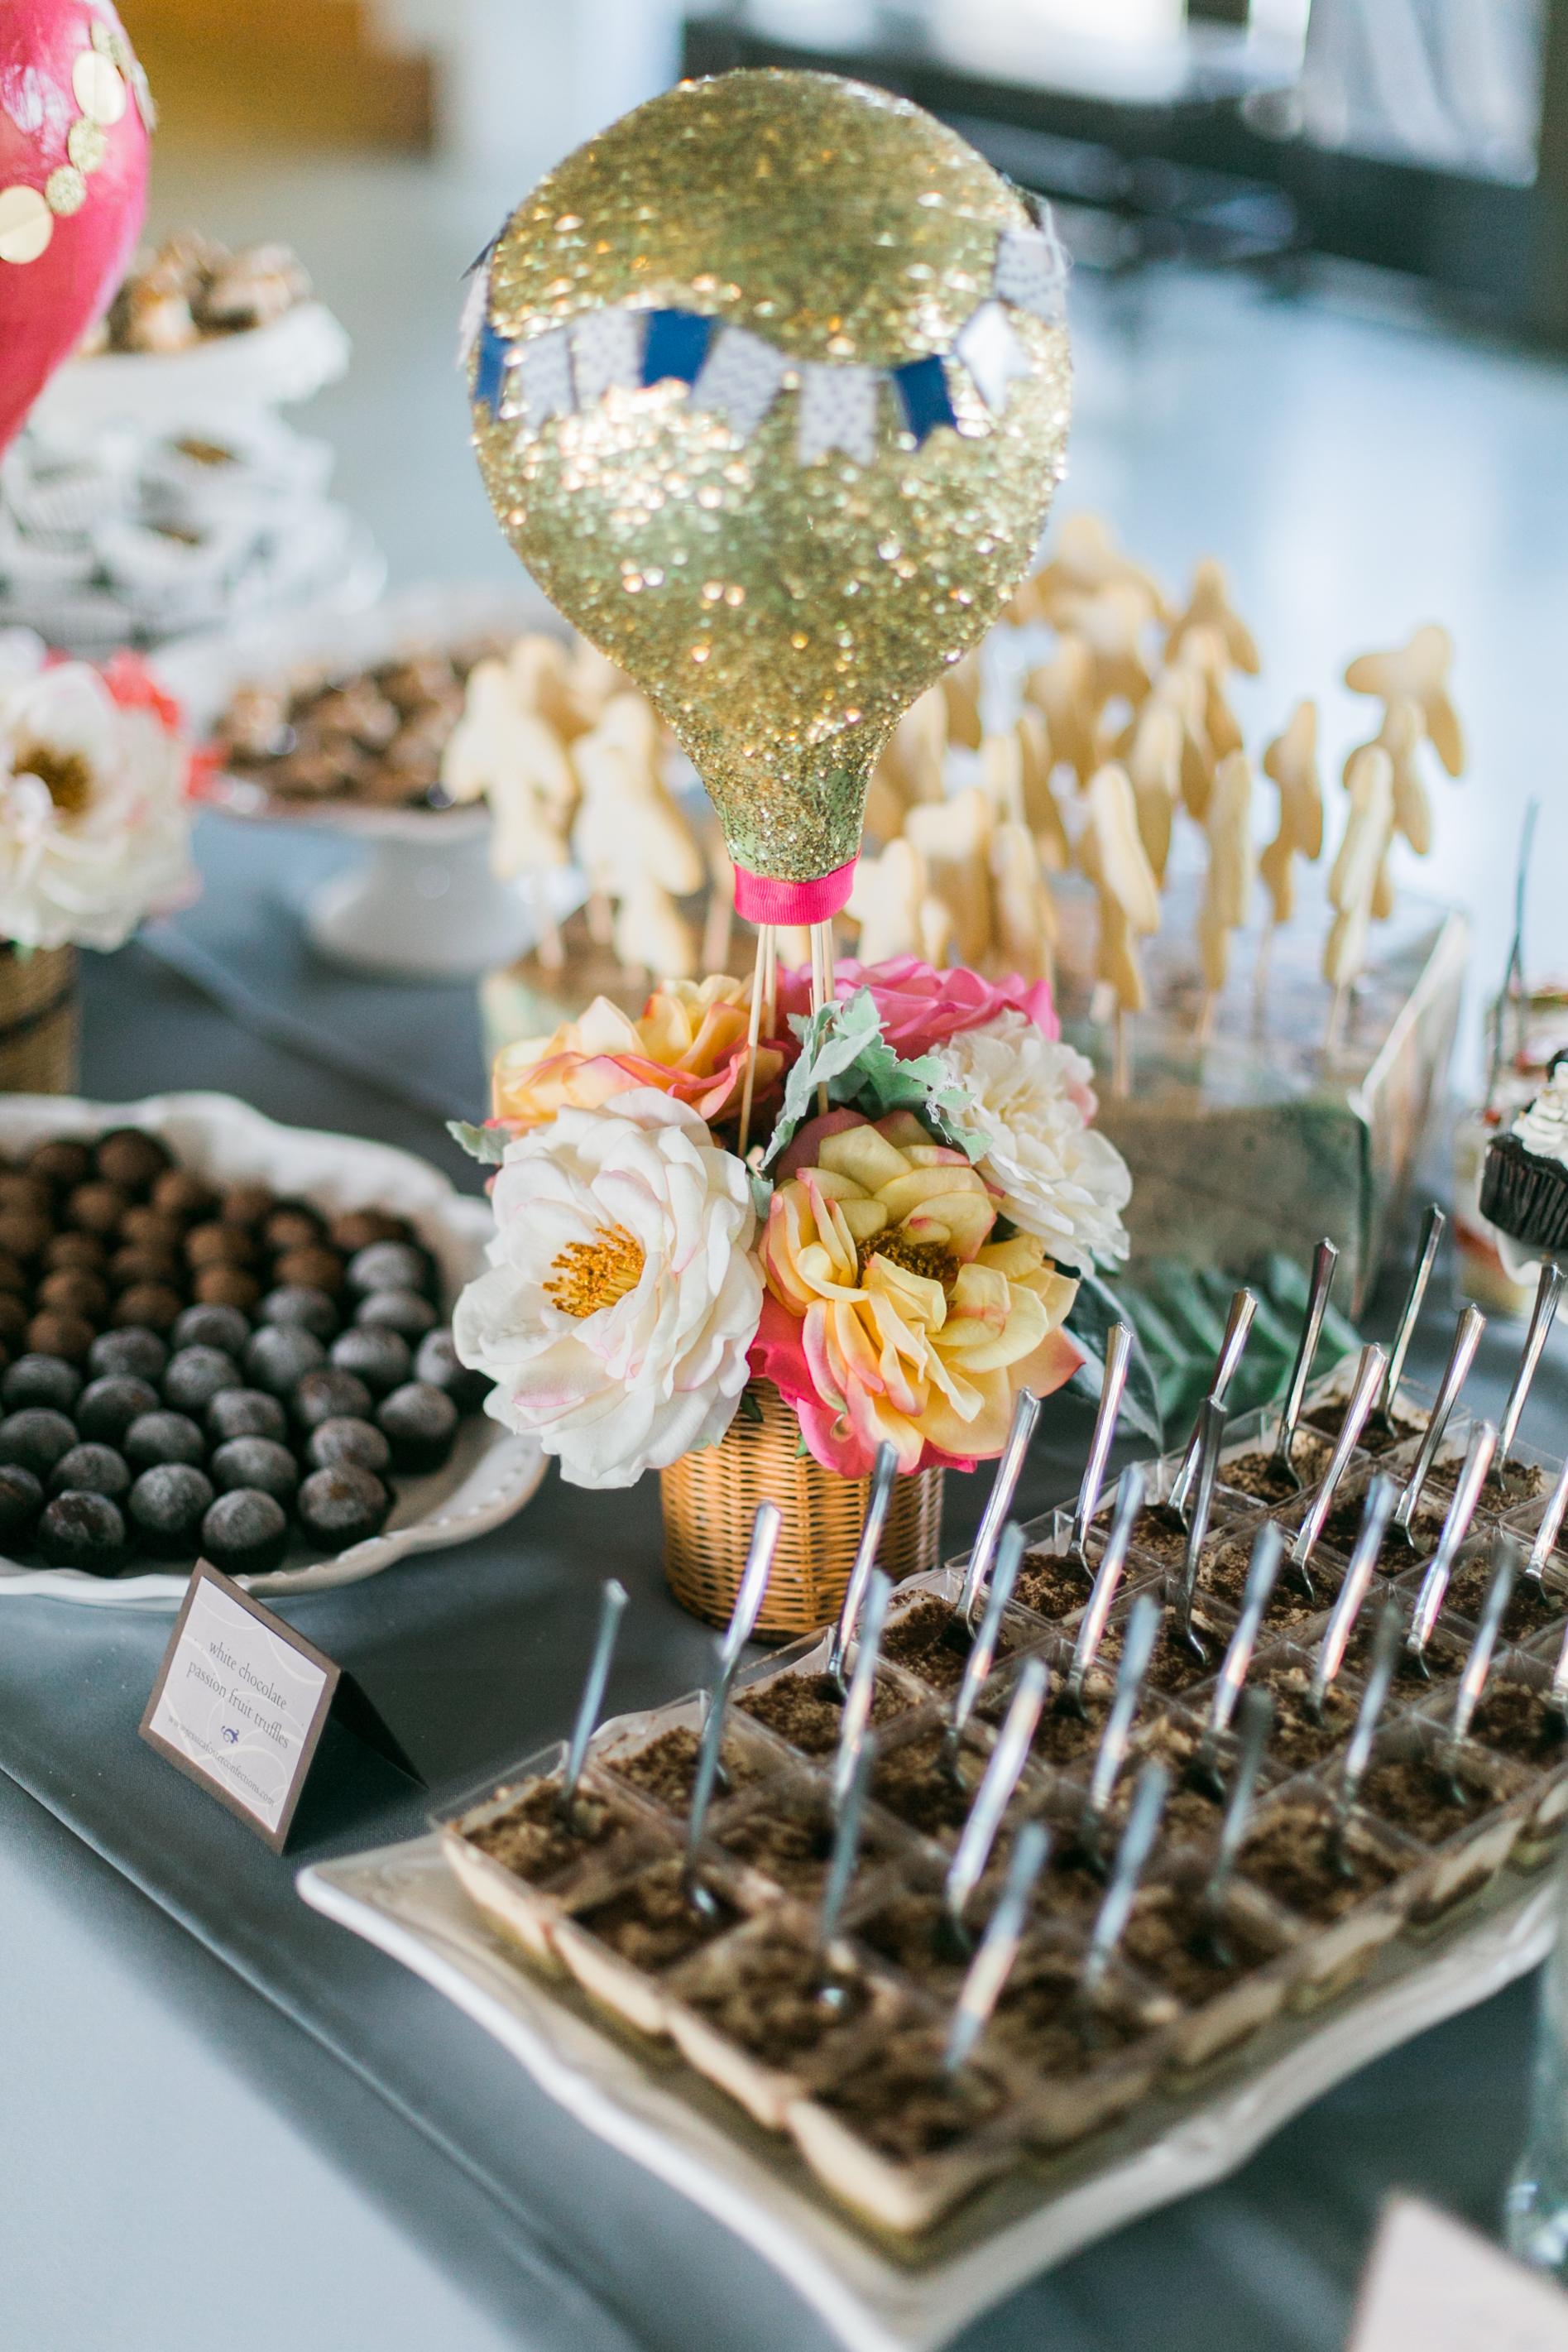 santabarbarawedding.com   photo: Steven Levya   Santa Barbara Wedding Style launch party   Top Destination Wedding Locations